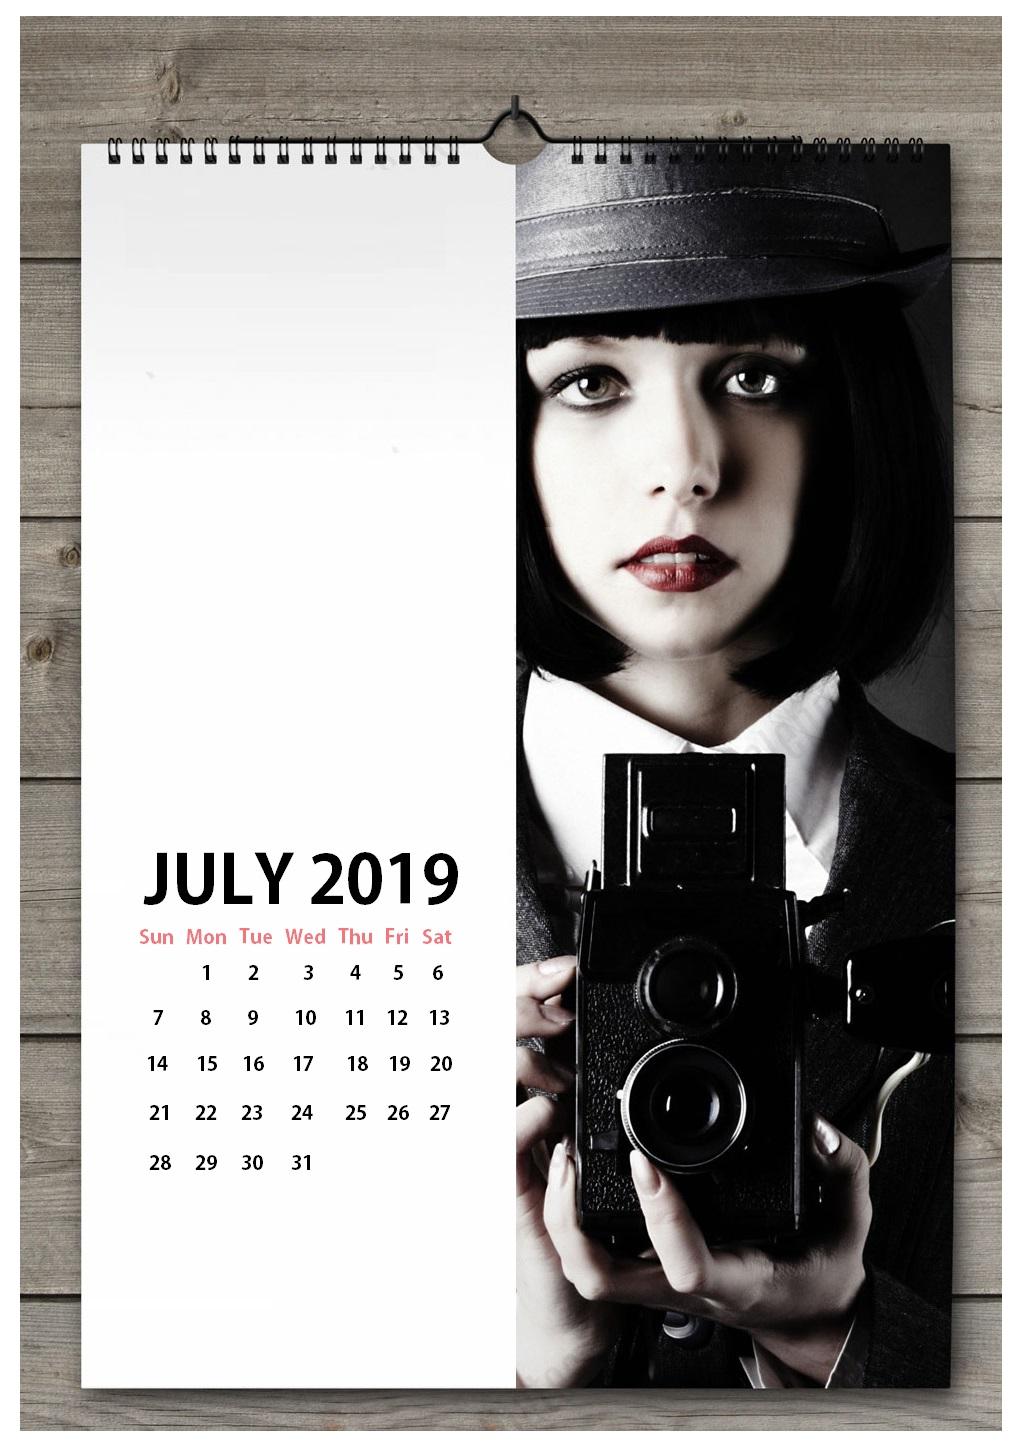 Free Printable July 2019 Wall Calendar